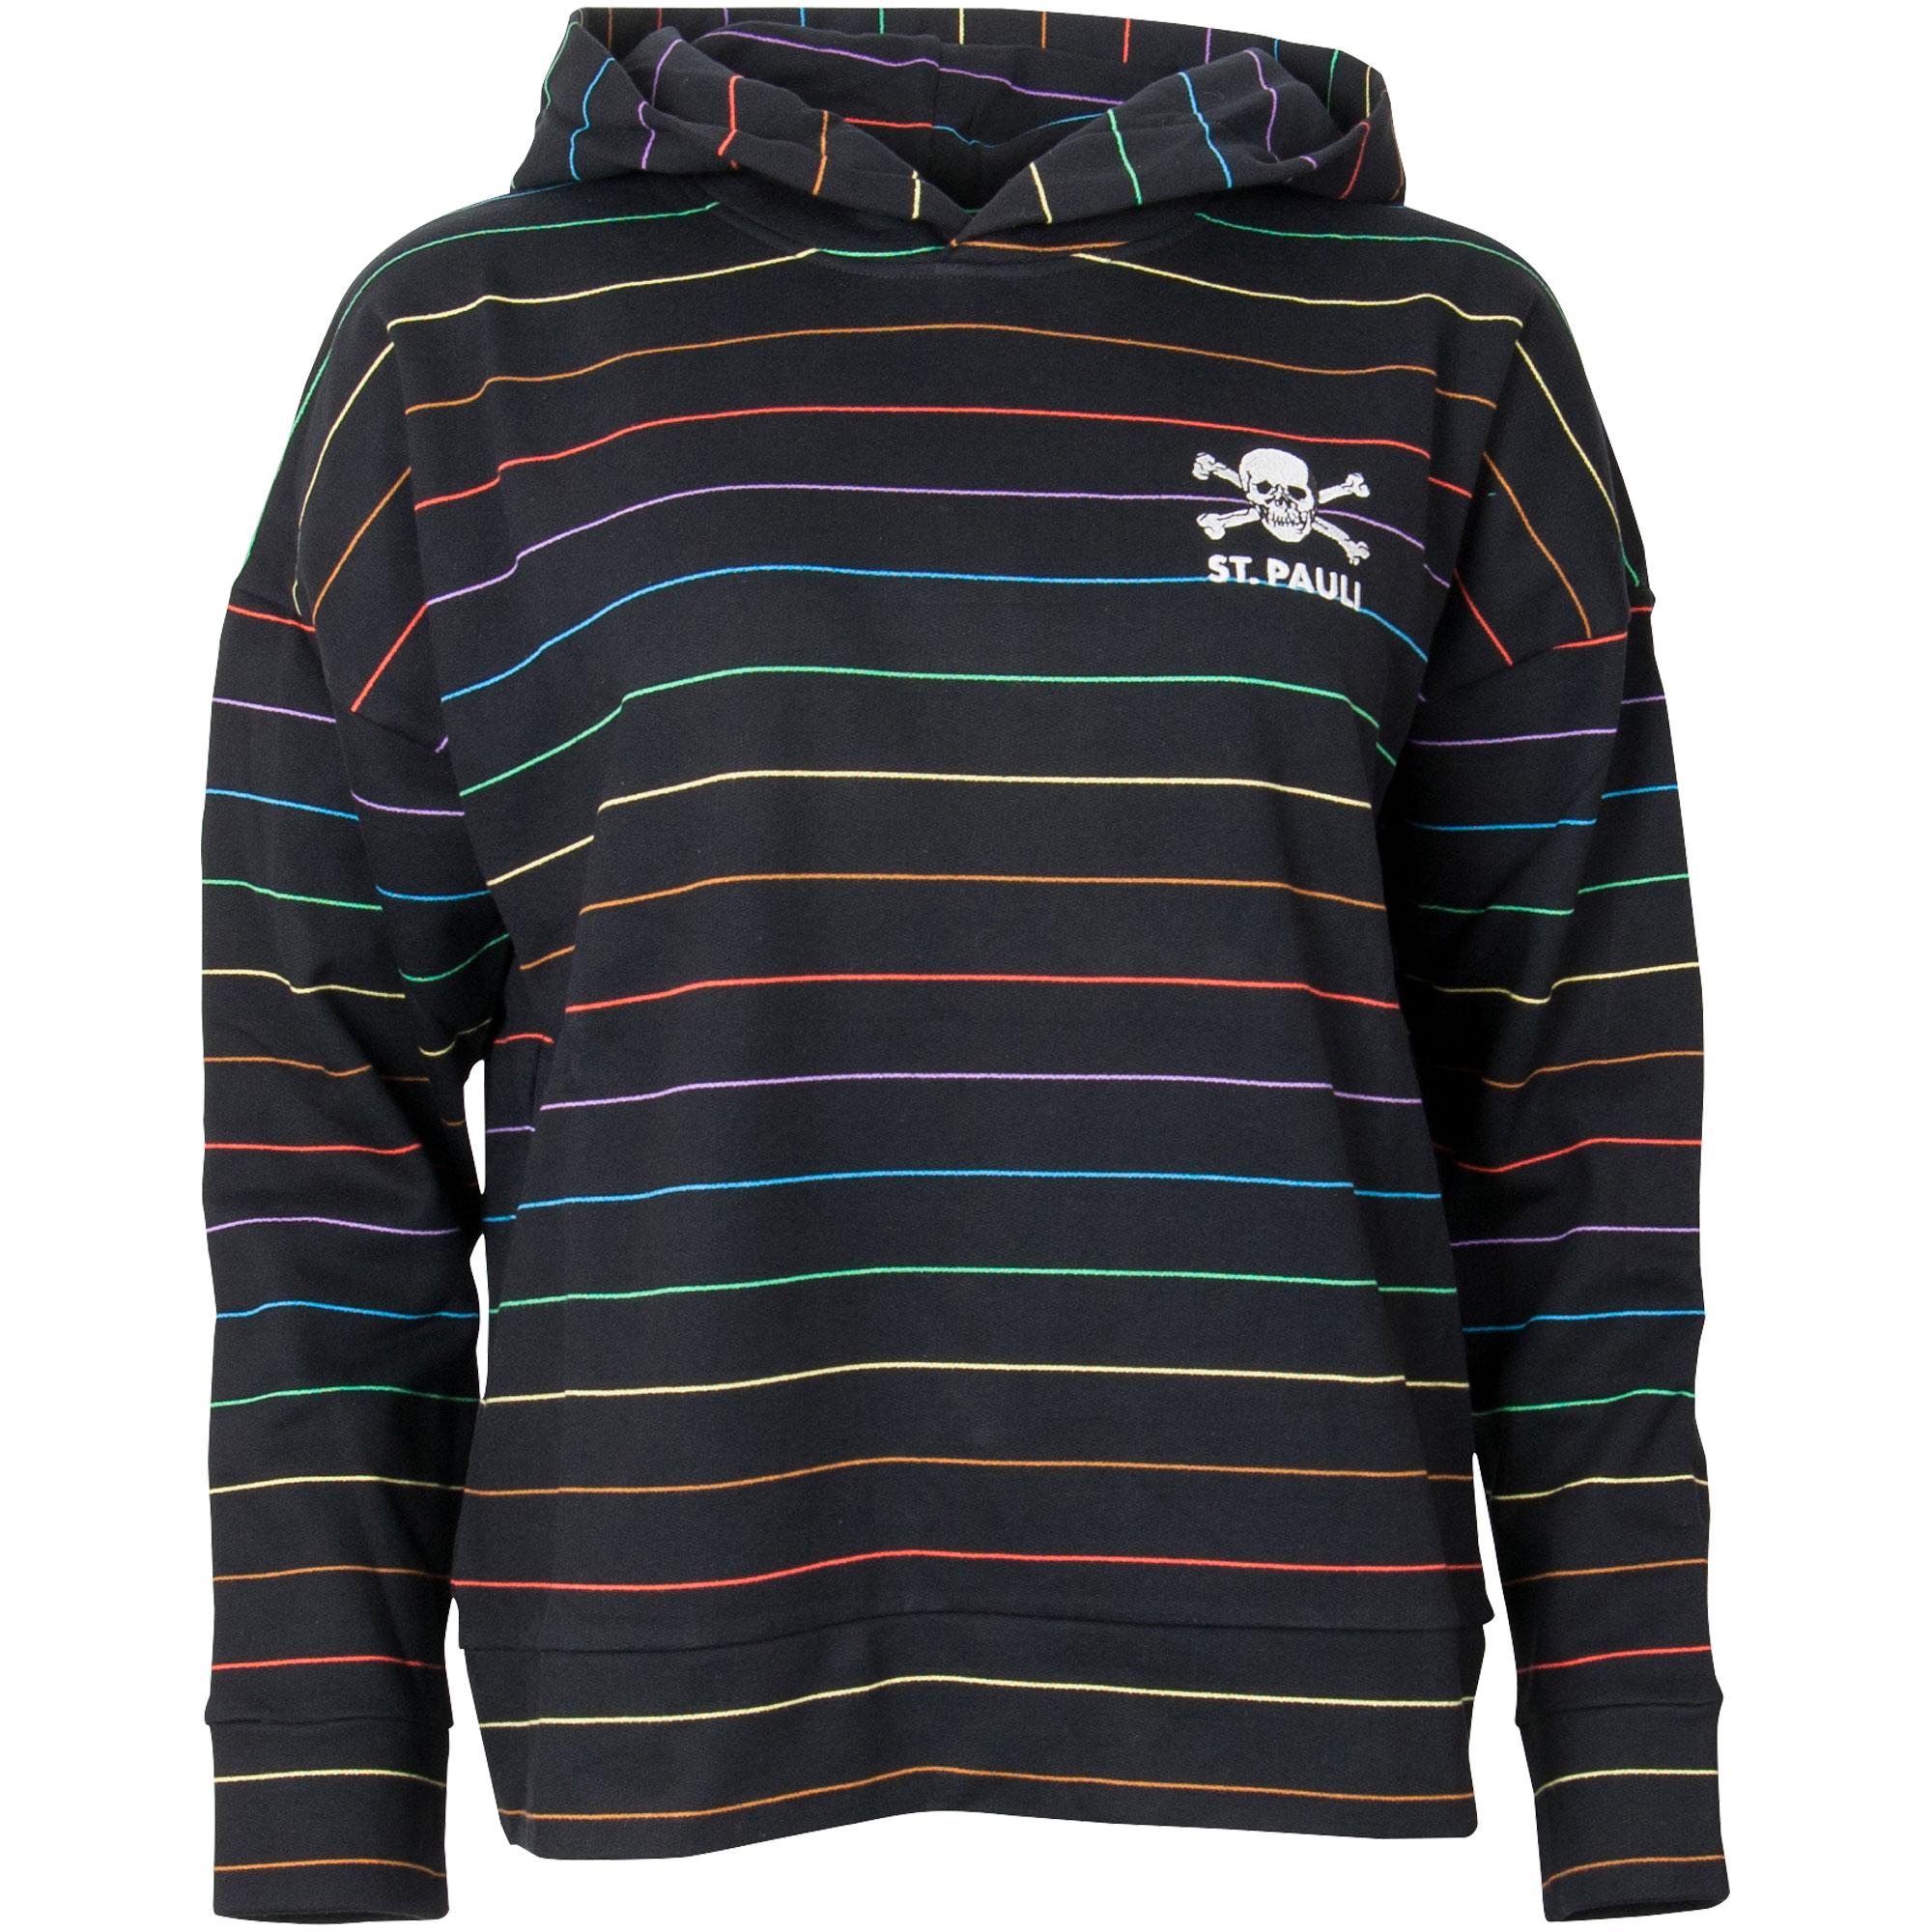 FC St. Pauli - Damen Kapuzenpullover Rainbow Stripes - schwarz